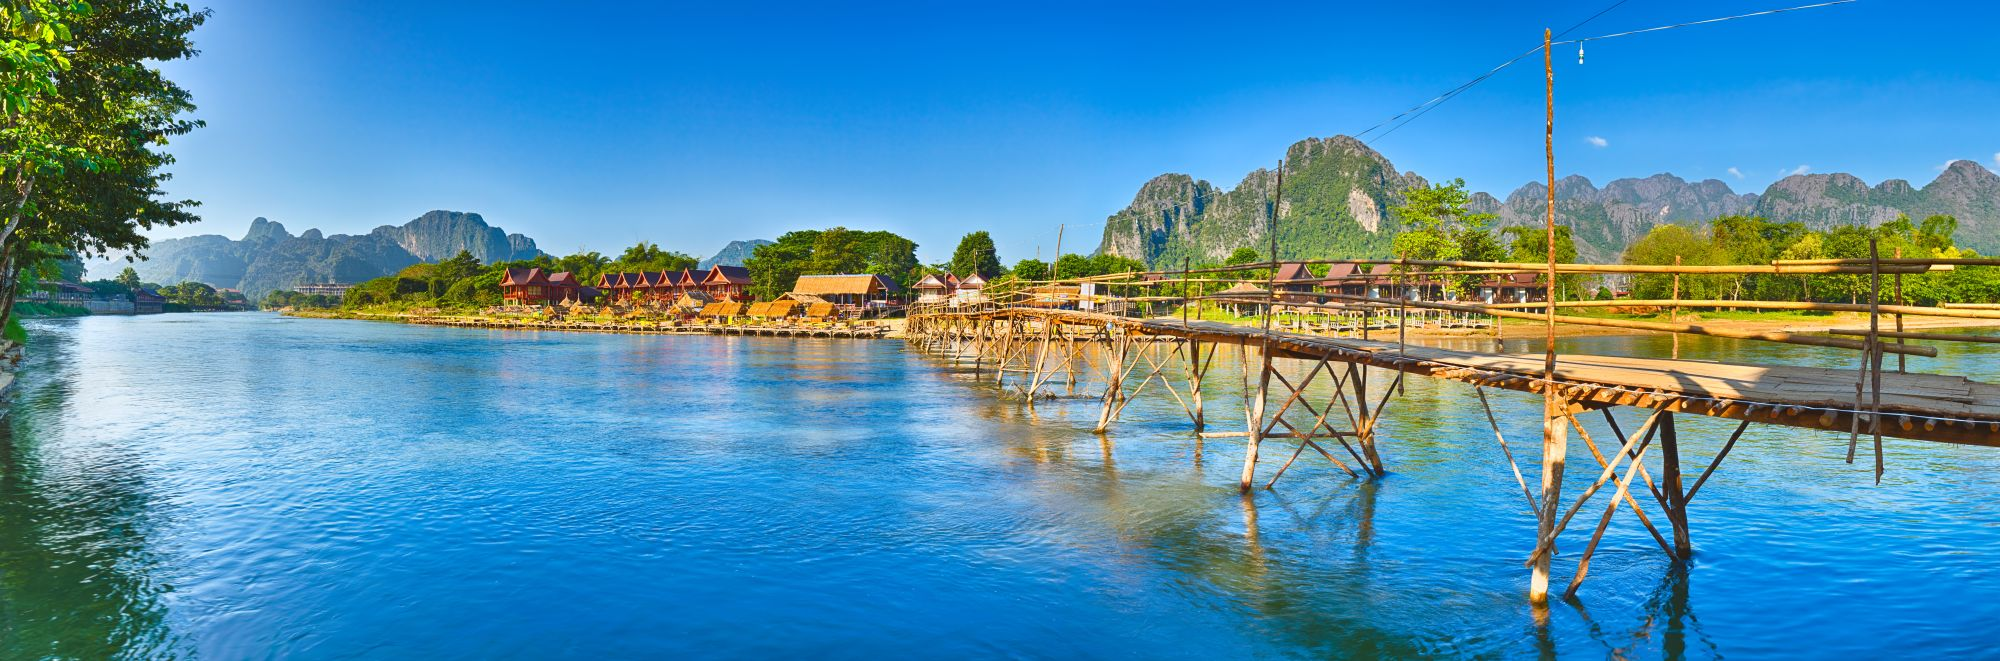 Laos Vang Vieng Bamboo brug